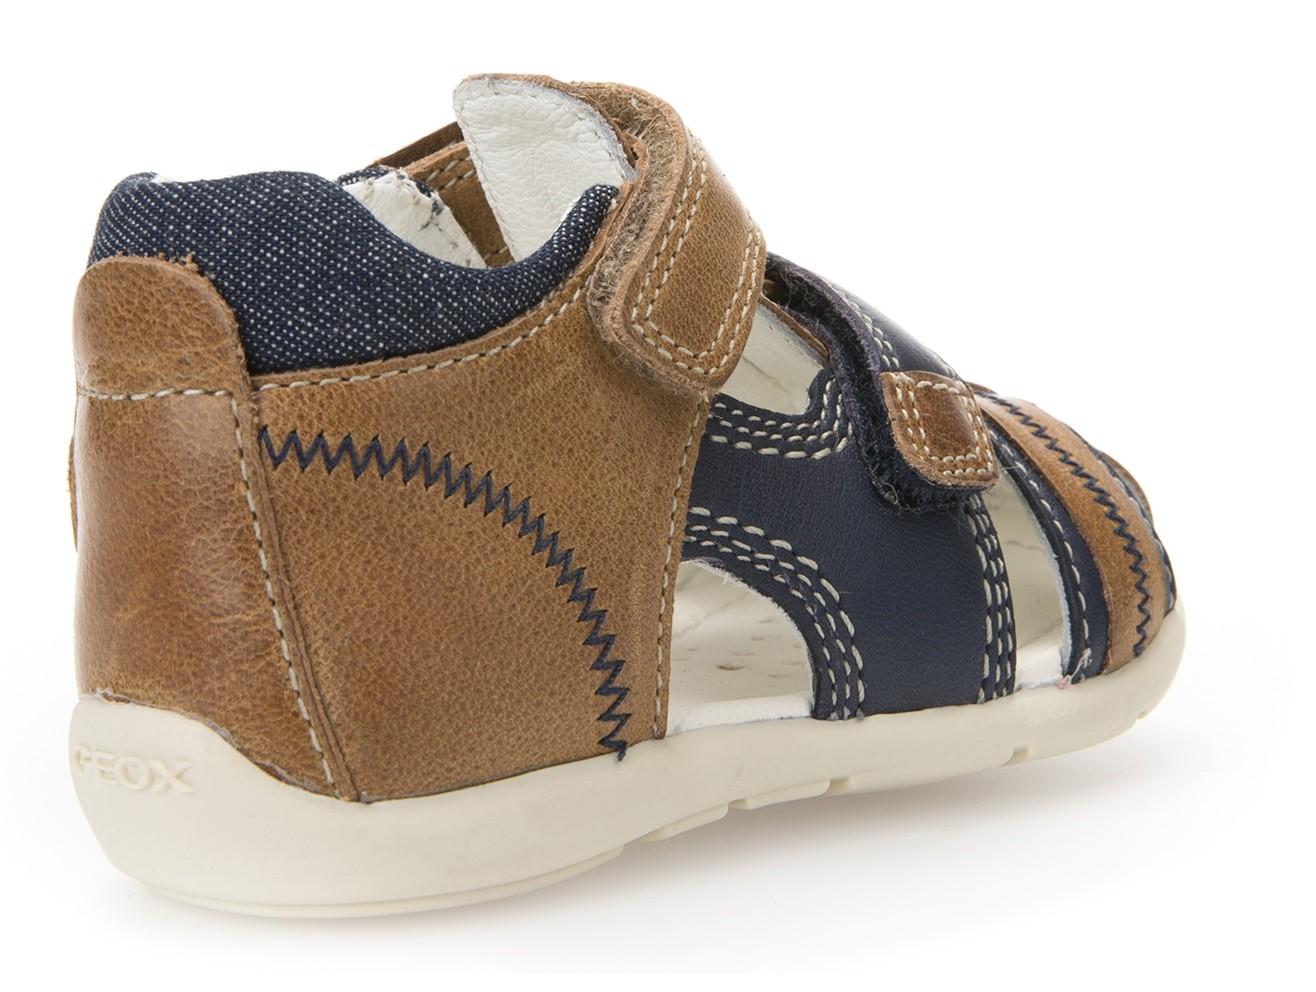 Geox Kaytan Caramel Navy Sandals Geox Kids Shoes